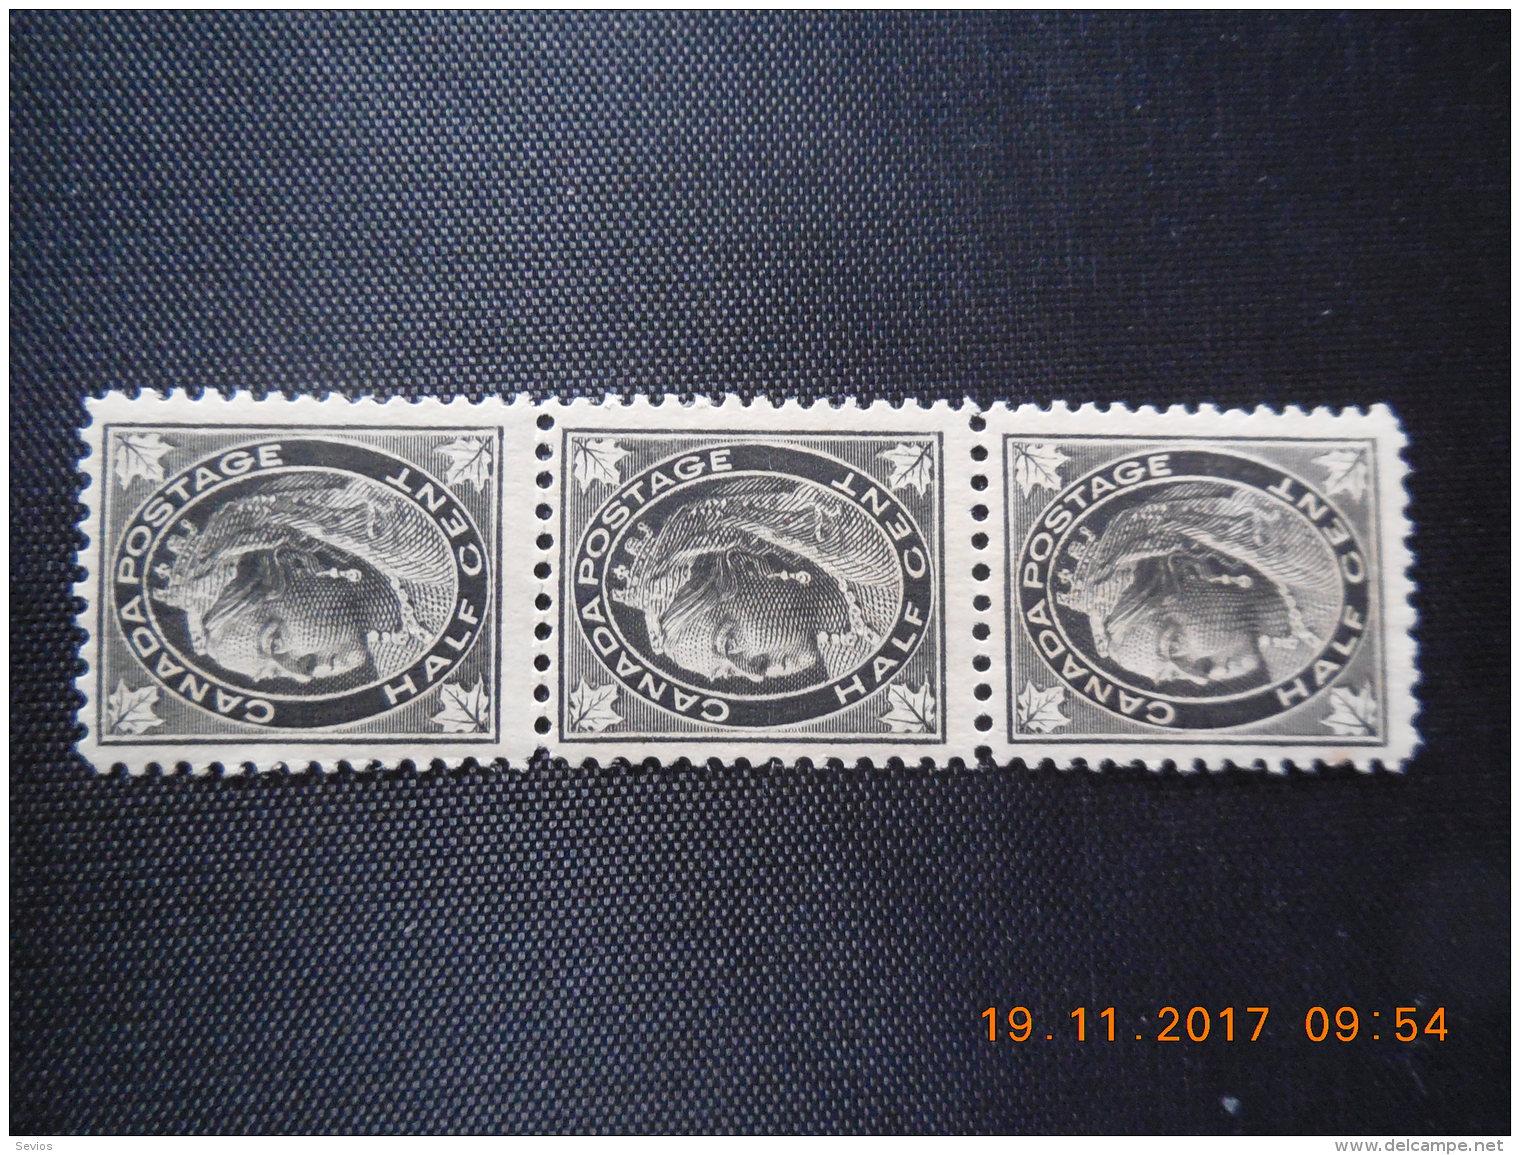 Sevios / Canada / Stamp **, *, (*) Or Used - Canada